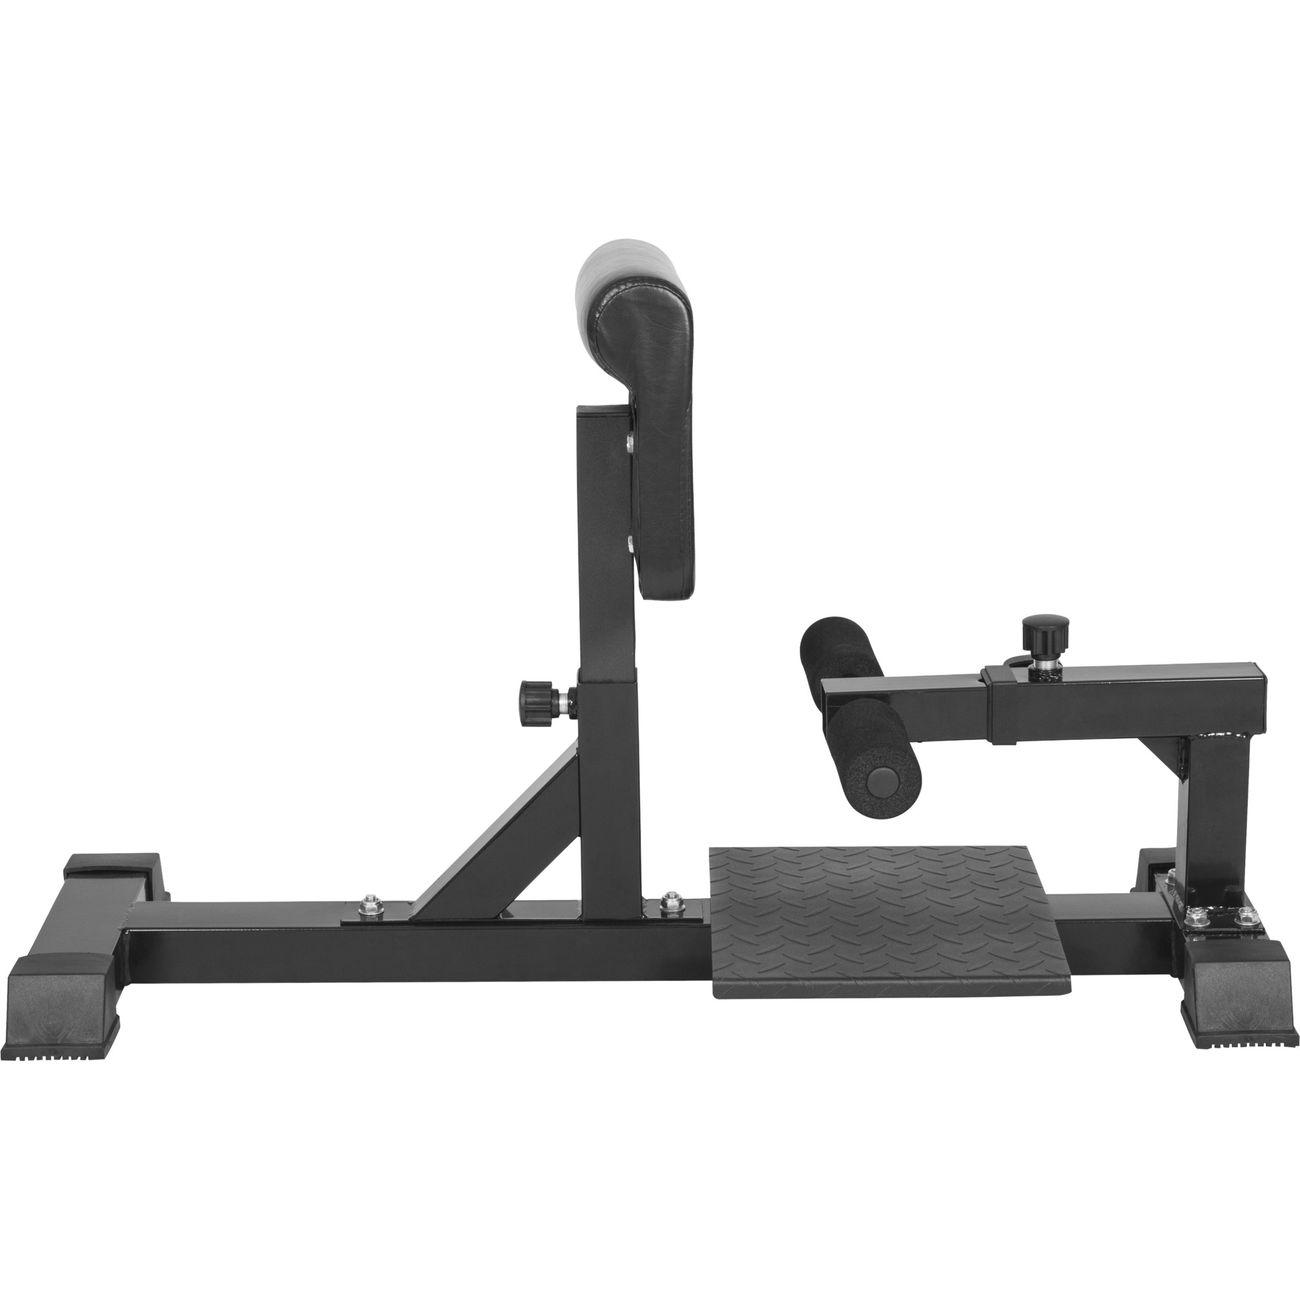 gorilla sports sissy squat machine appareil abdominal et dos achat et prix pas cher go sport. Black Bedroom Furniture Sets. Home Design Ideas